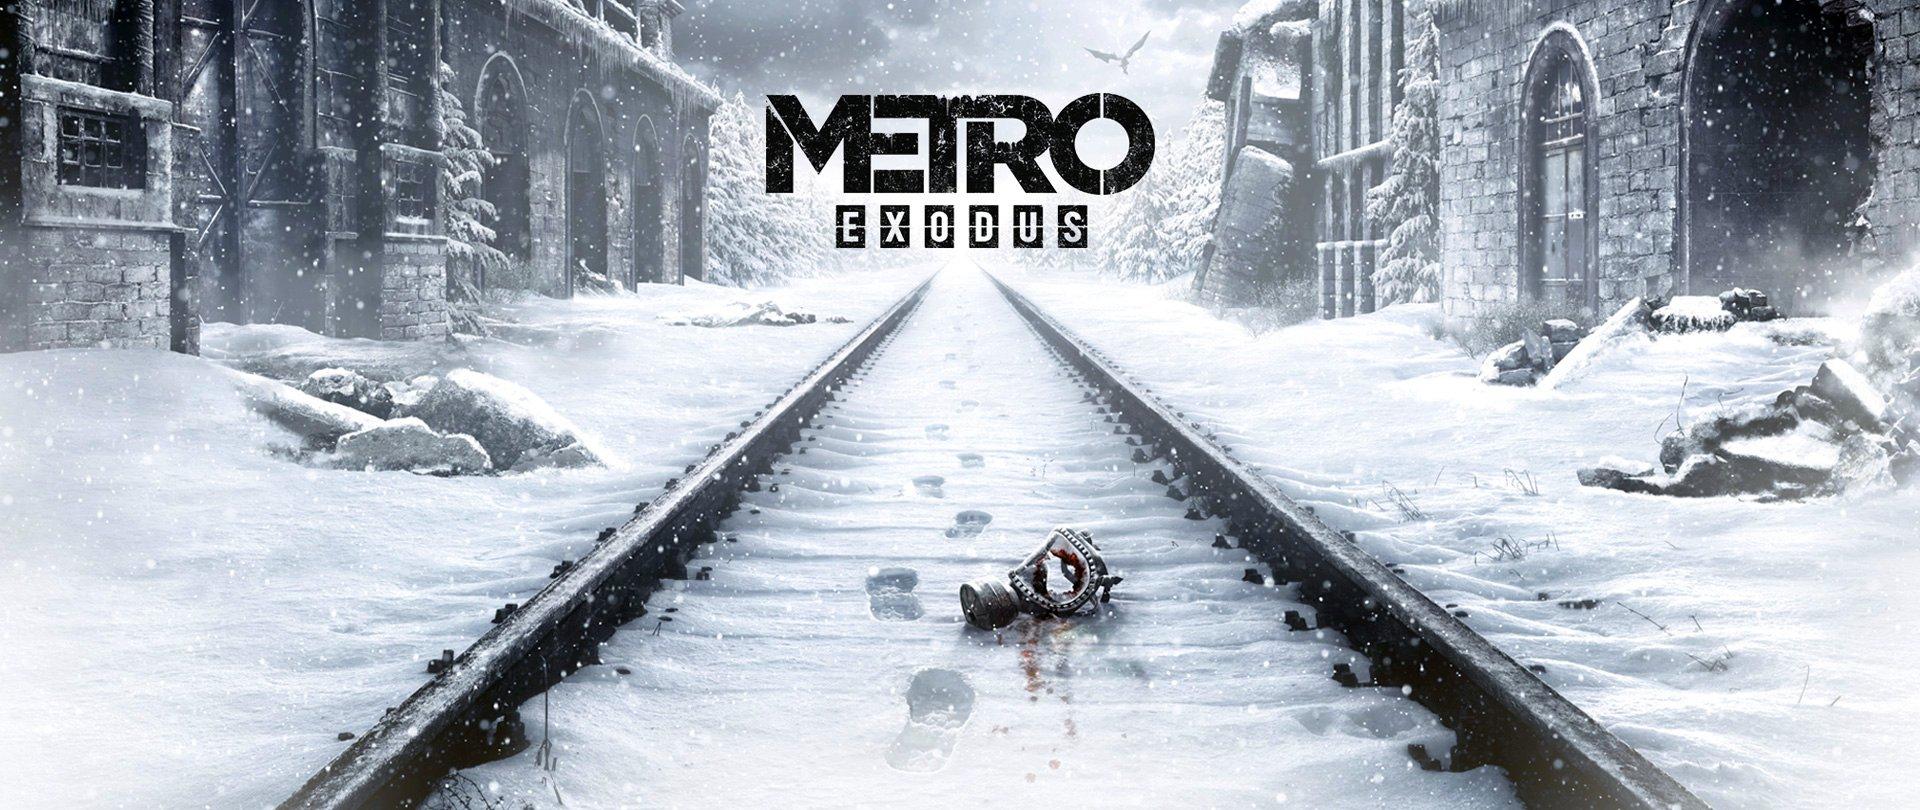 E3 2017: Metro Exodus Announced, Gameplay Trailer